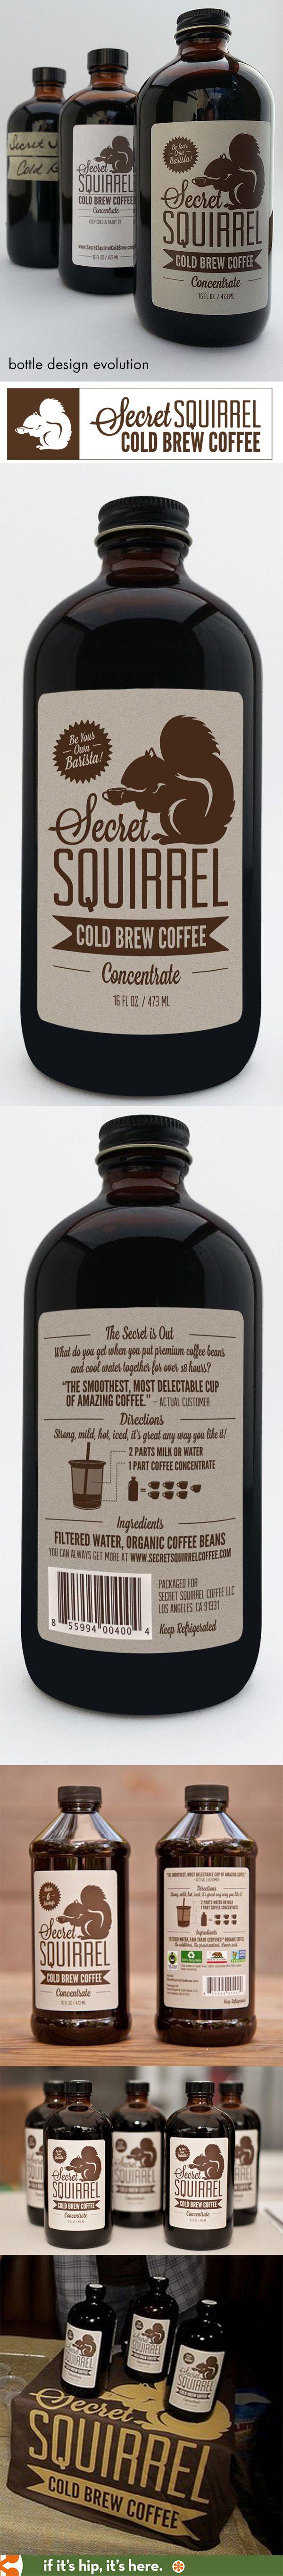 Here you go SmallBlackRoom Secret Squirrel Cold Brew Coffee Concentrate's Bottle Design Evolution PD